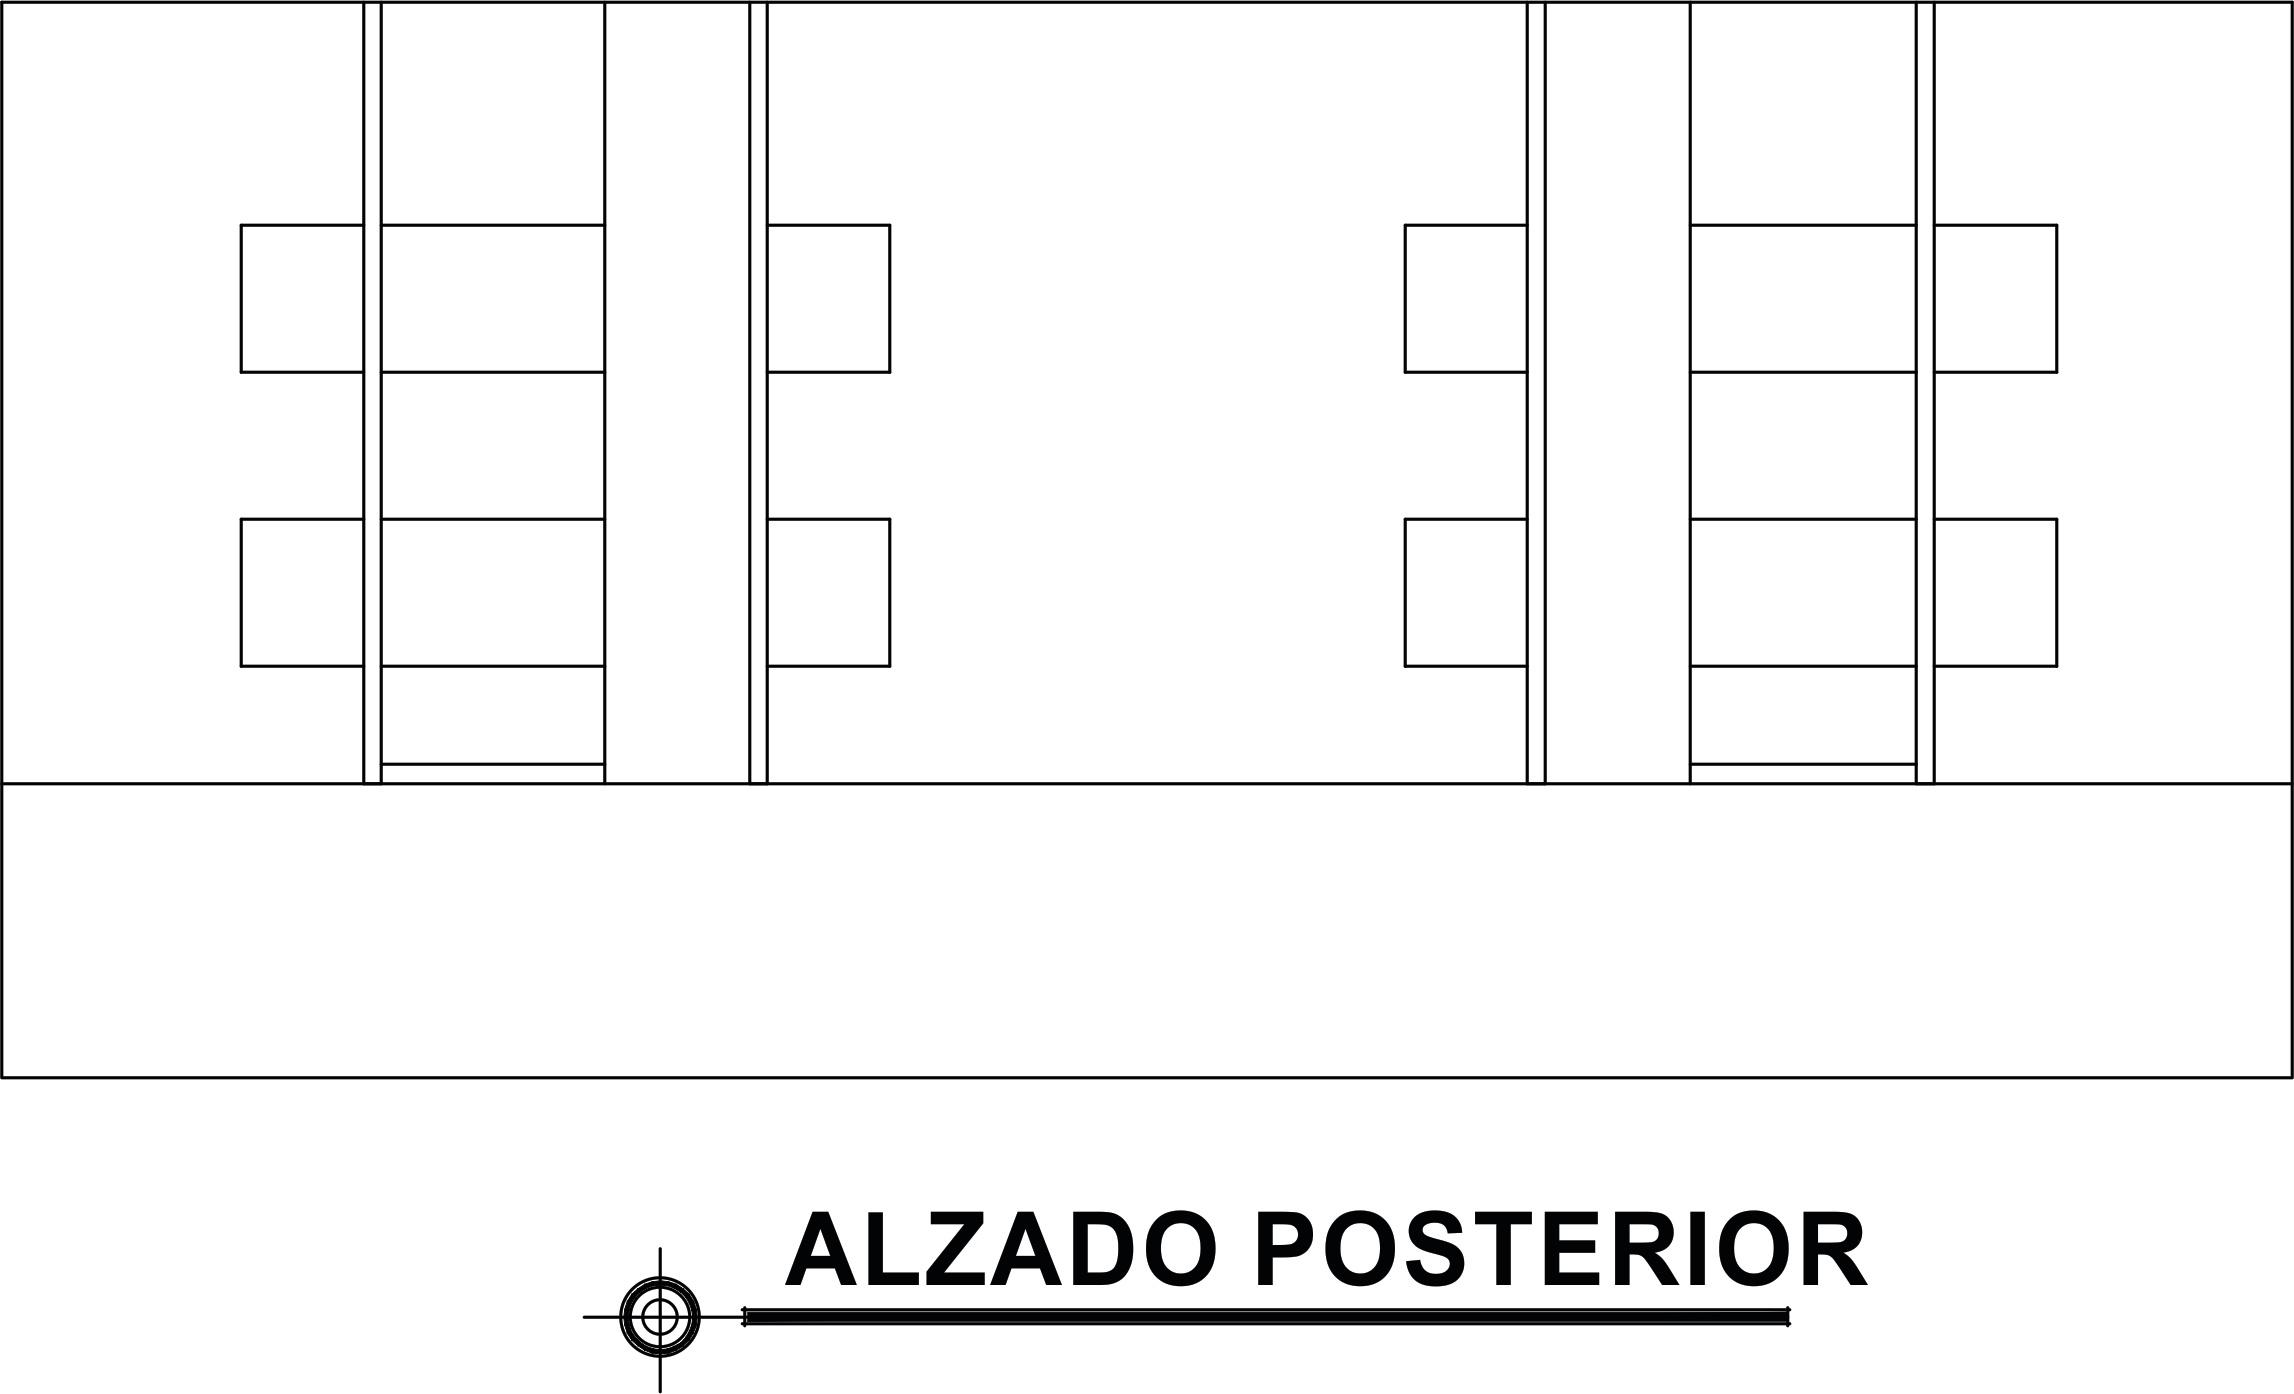 ALZADO POSTERIOR